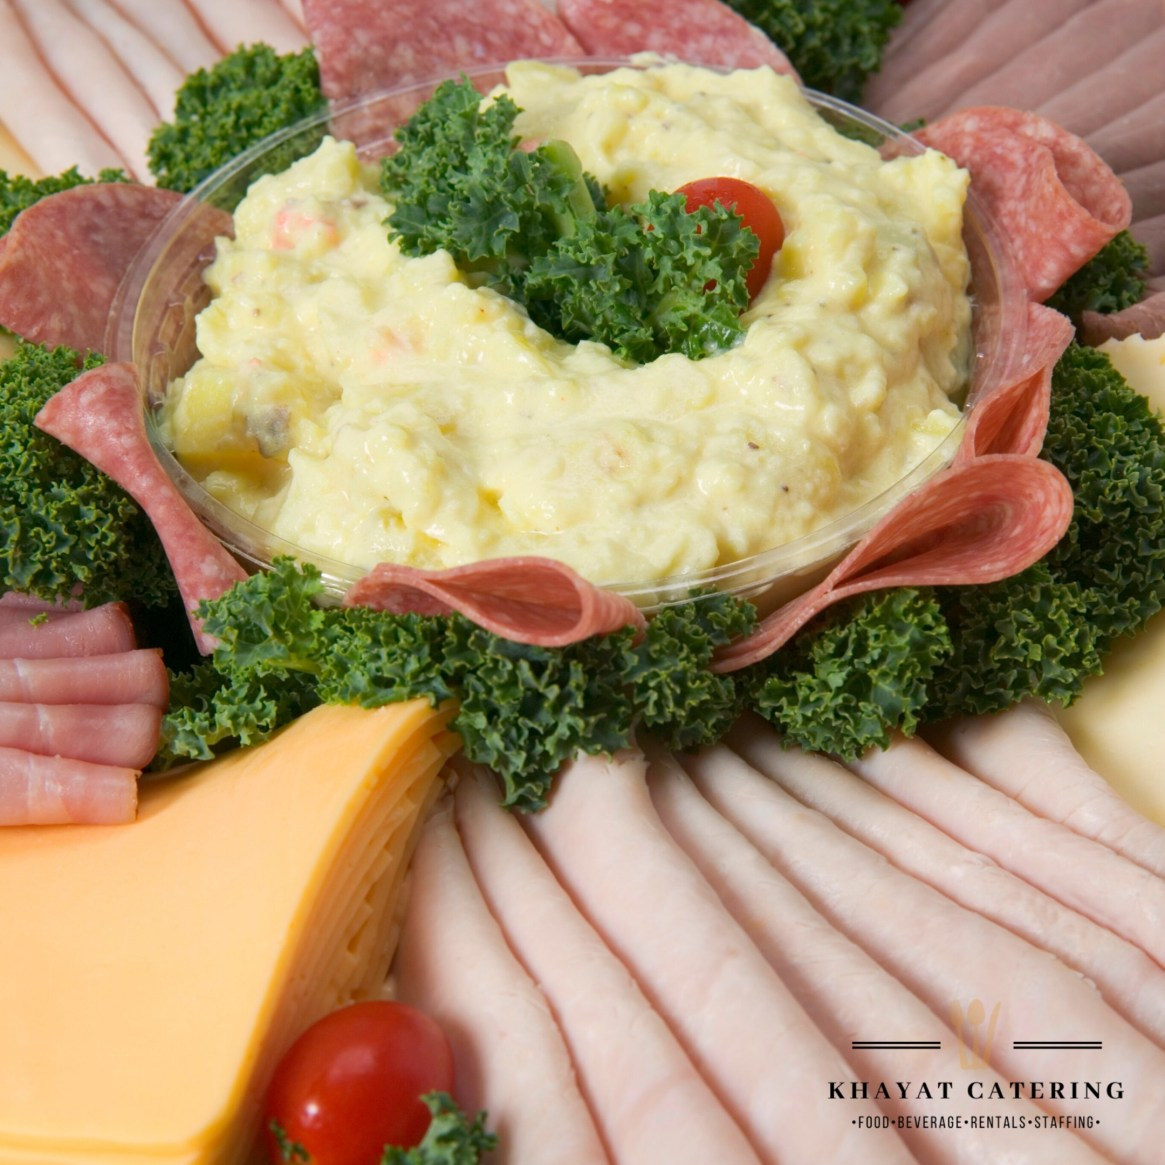 Khayat Catering deli meat platter